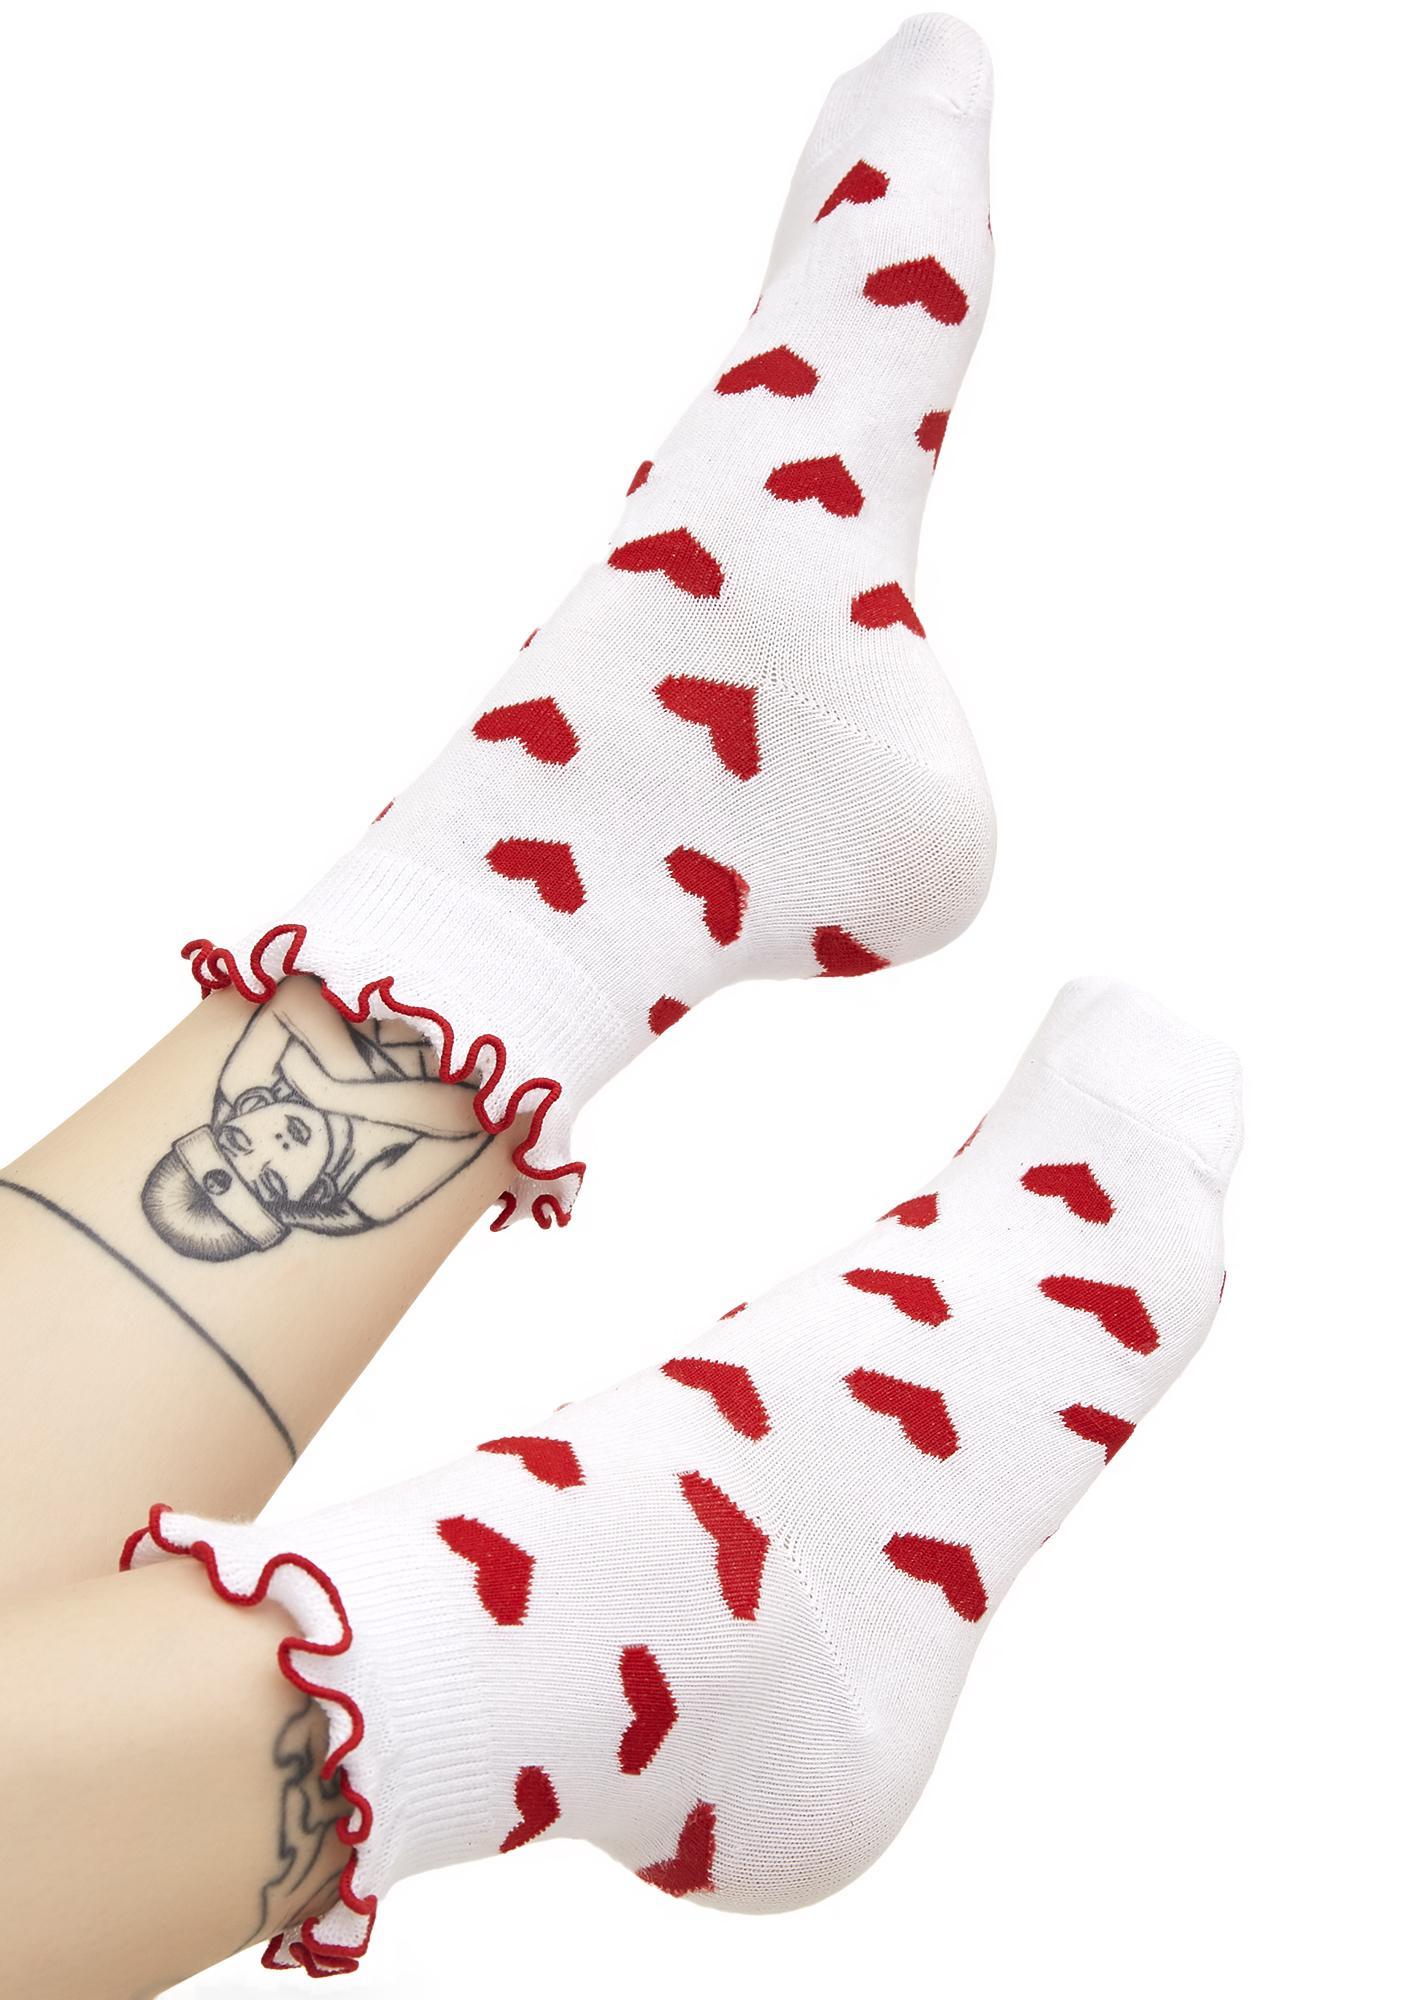 Lazy Oaf Red Hearts Socks